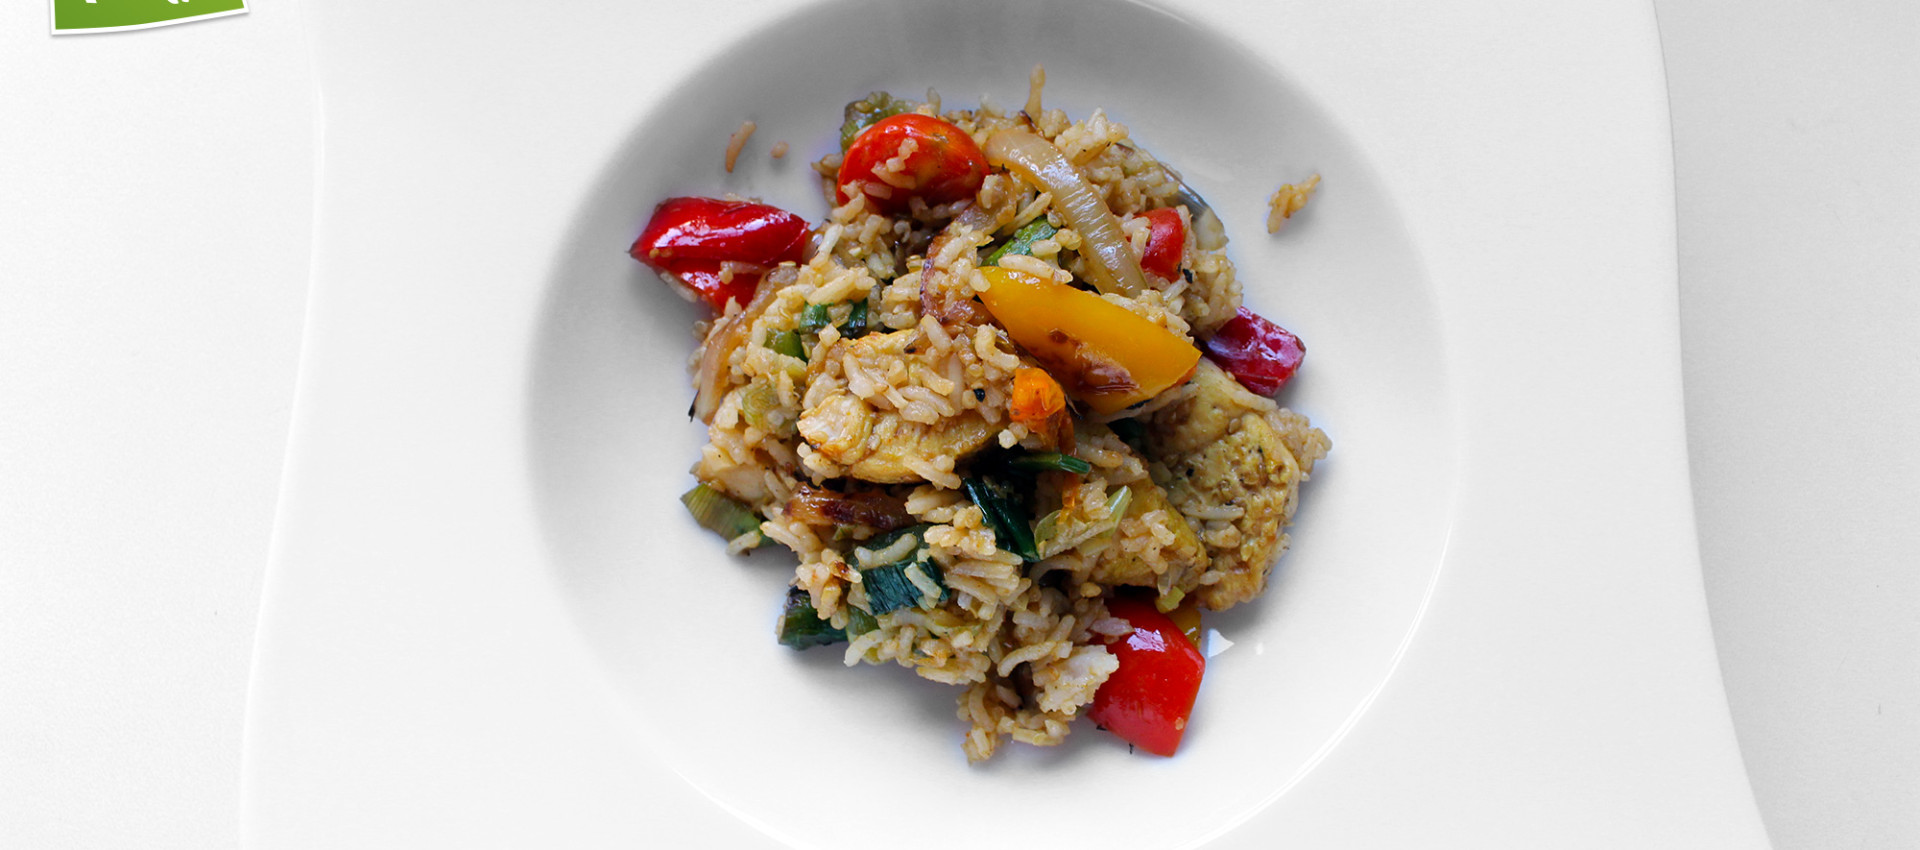 Rezept gebratenes Gemüse mit Reis & Spargel von KochBock.de